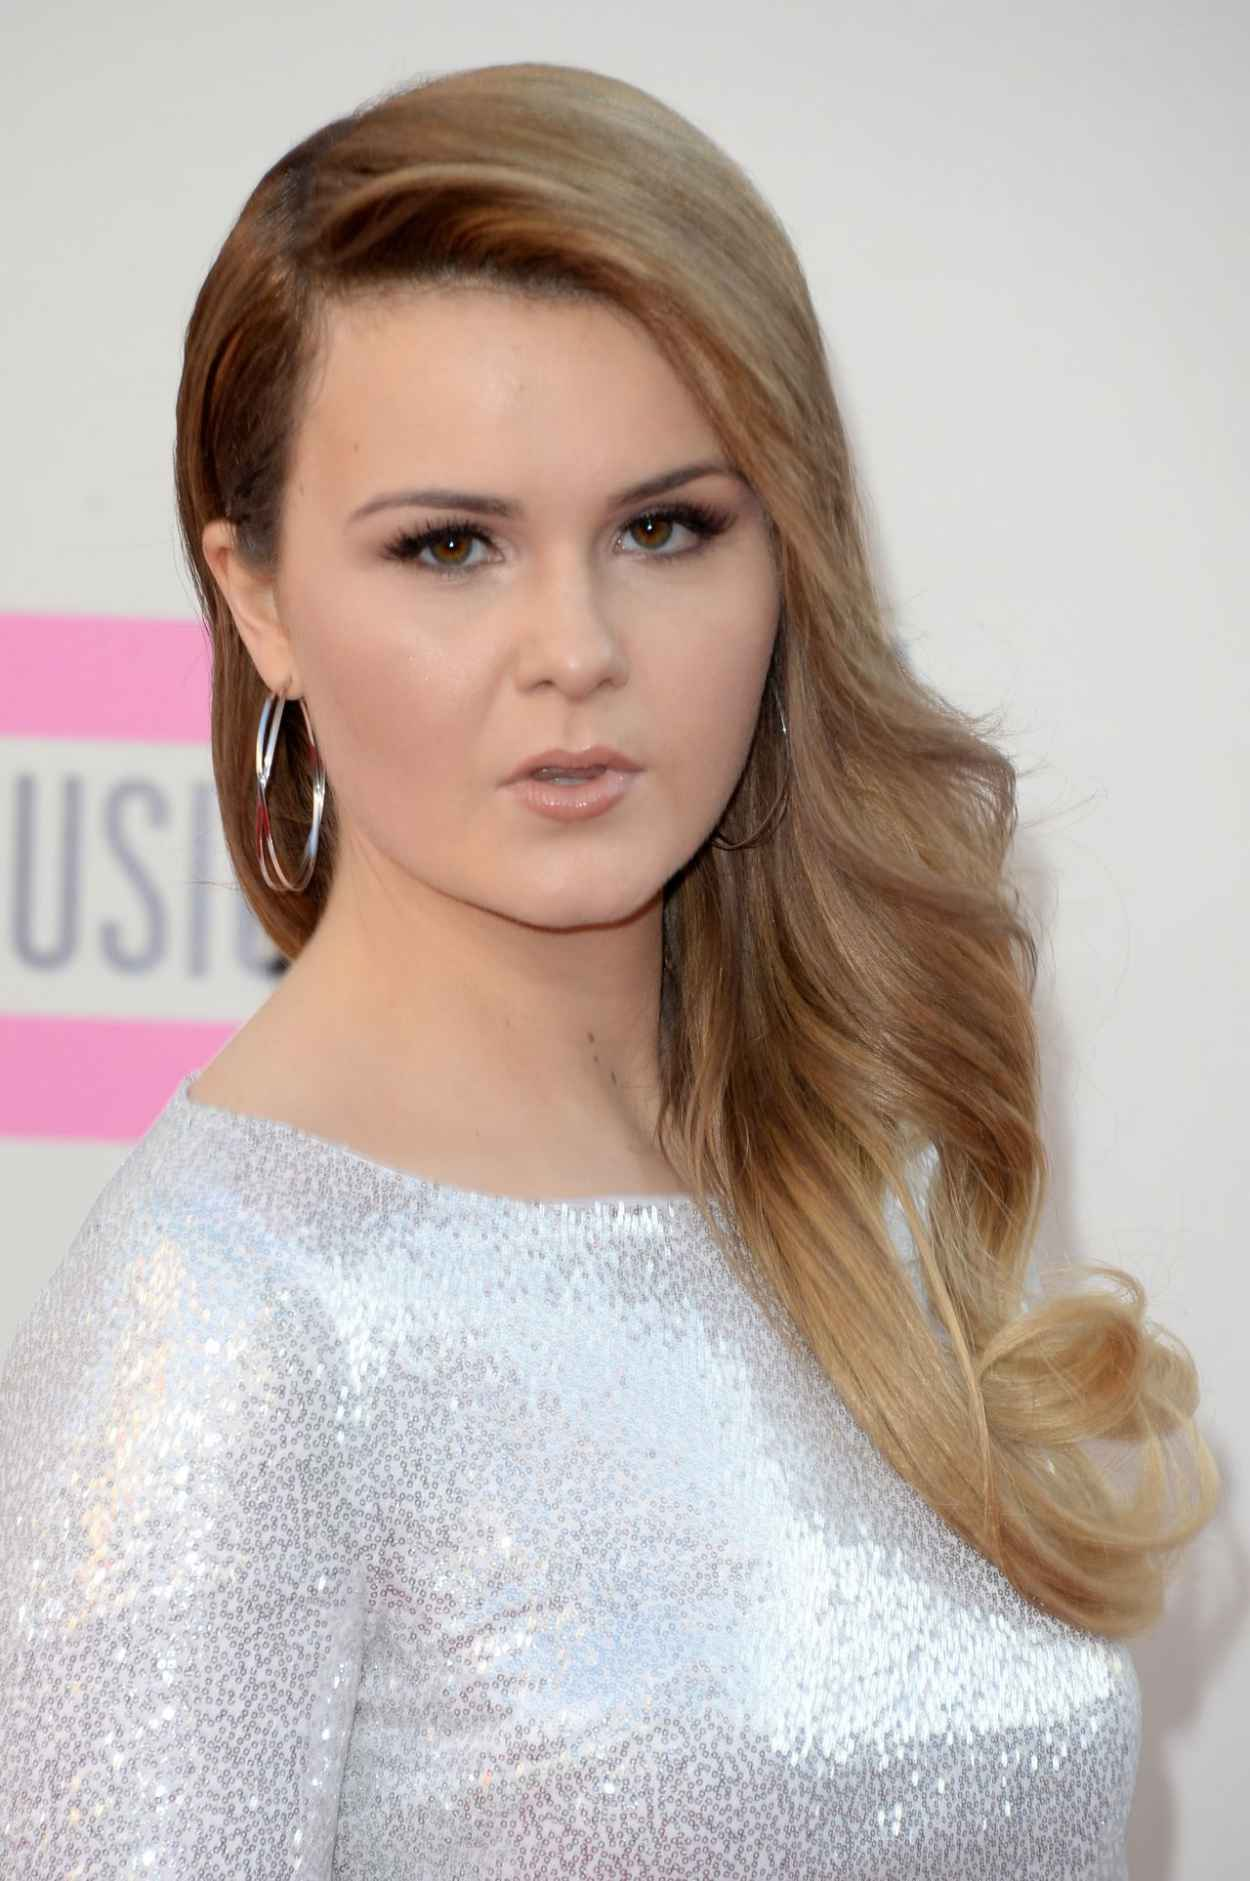 Ashley Keating Red Carpet Photos - 2015 American Music Awards - Los Angeles November 2015-1